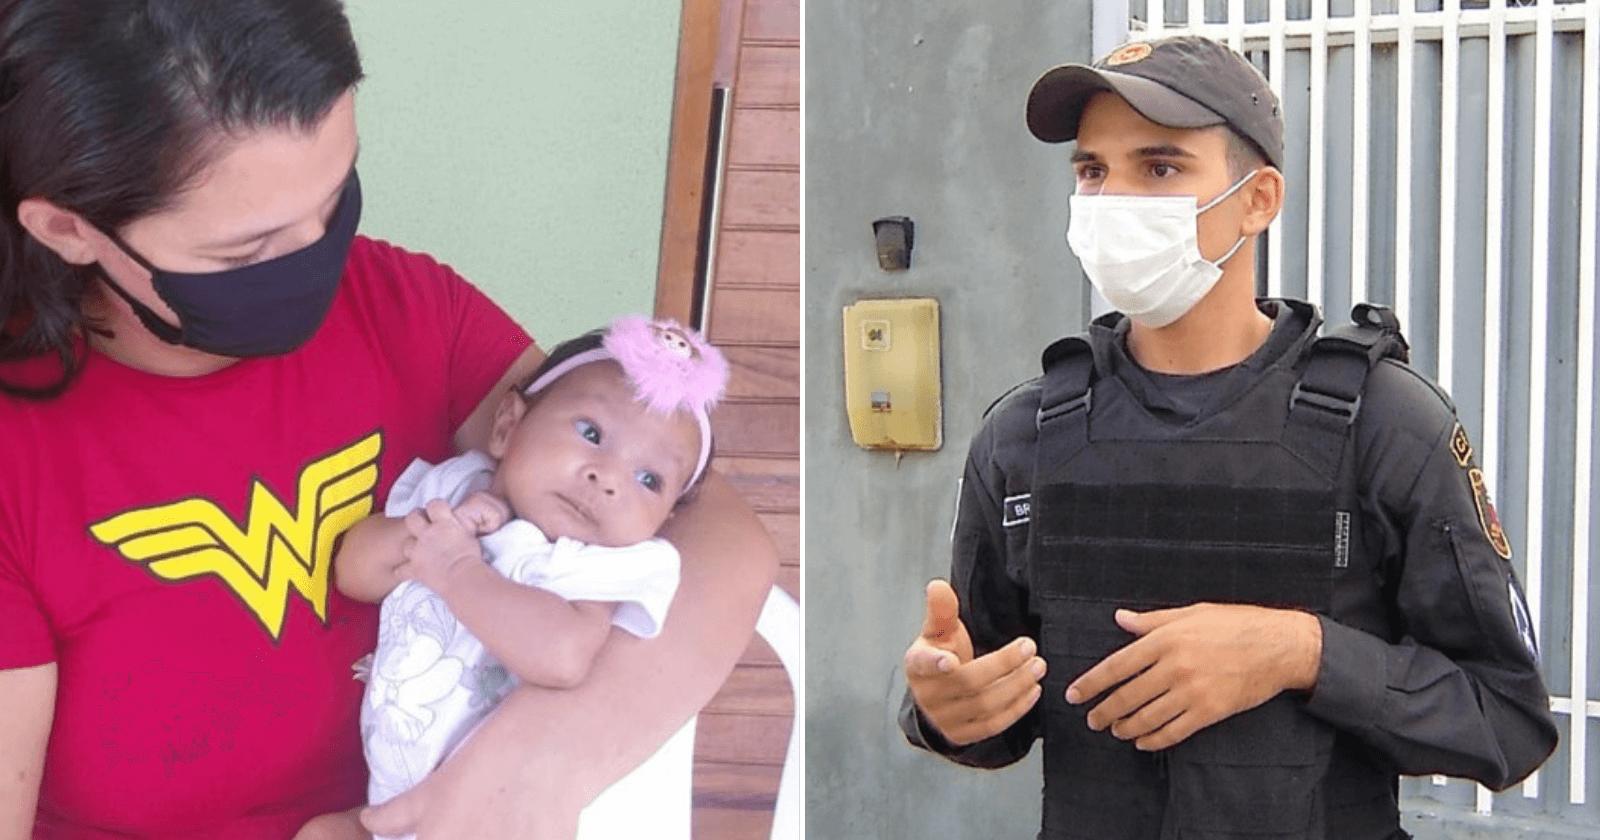 Policial salva vida de bebê de 2 meses que estava engasgado